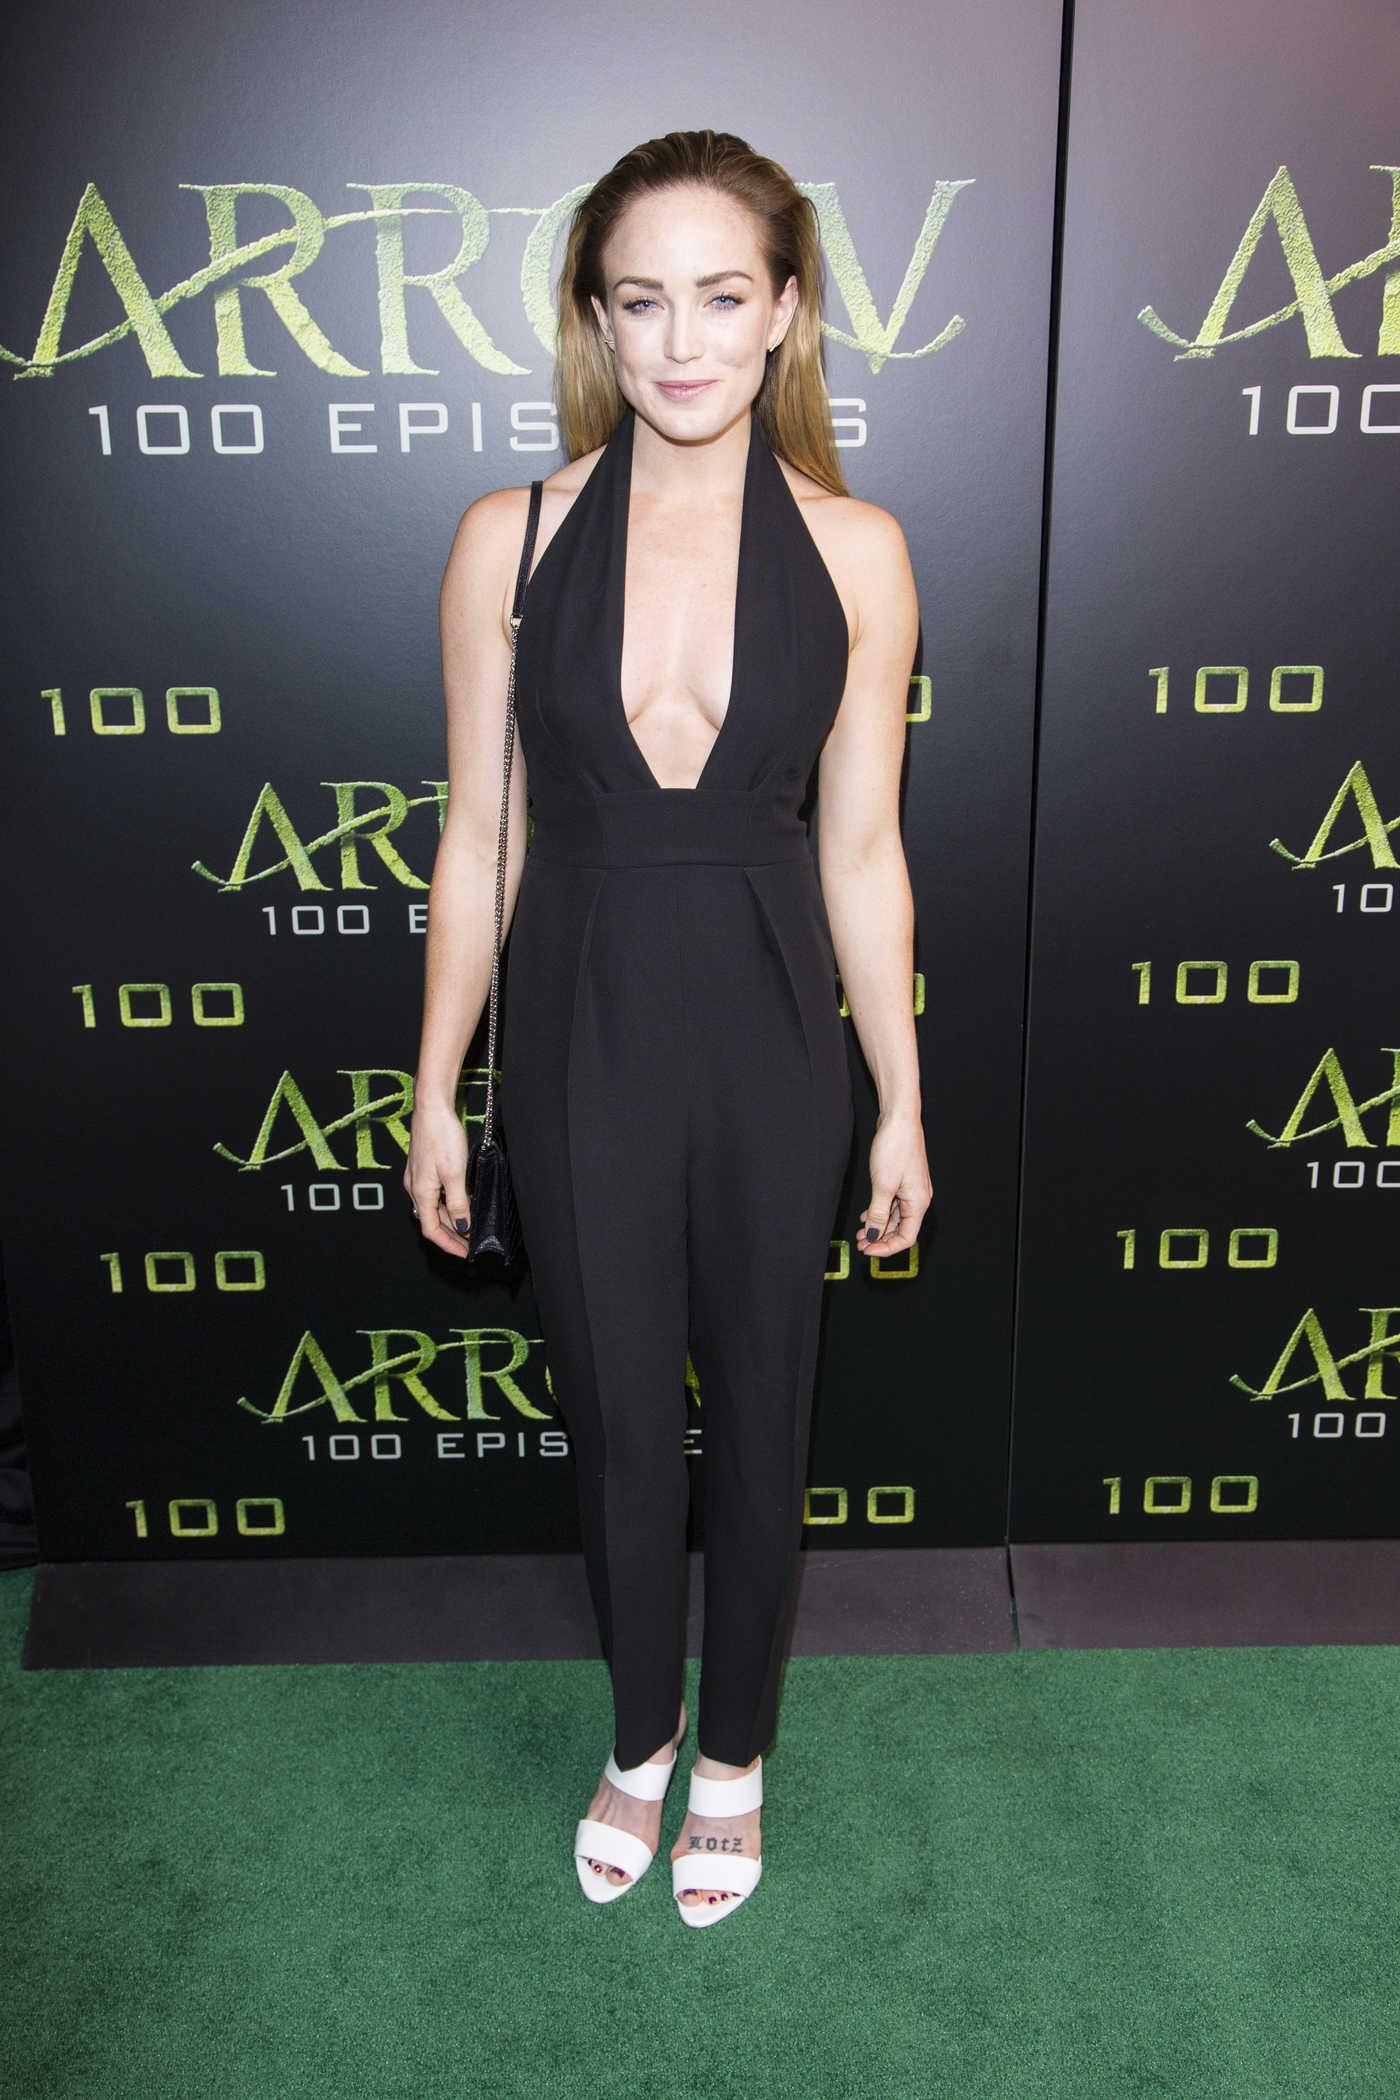 Caity Lotz Celebrates the 100th Episode of Arrow 10/22/2016